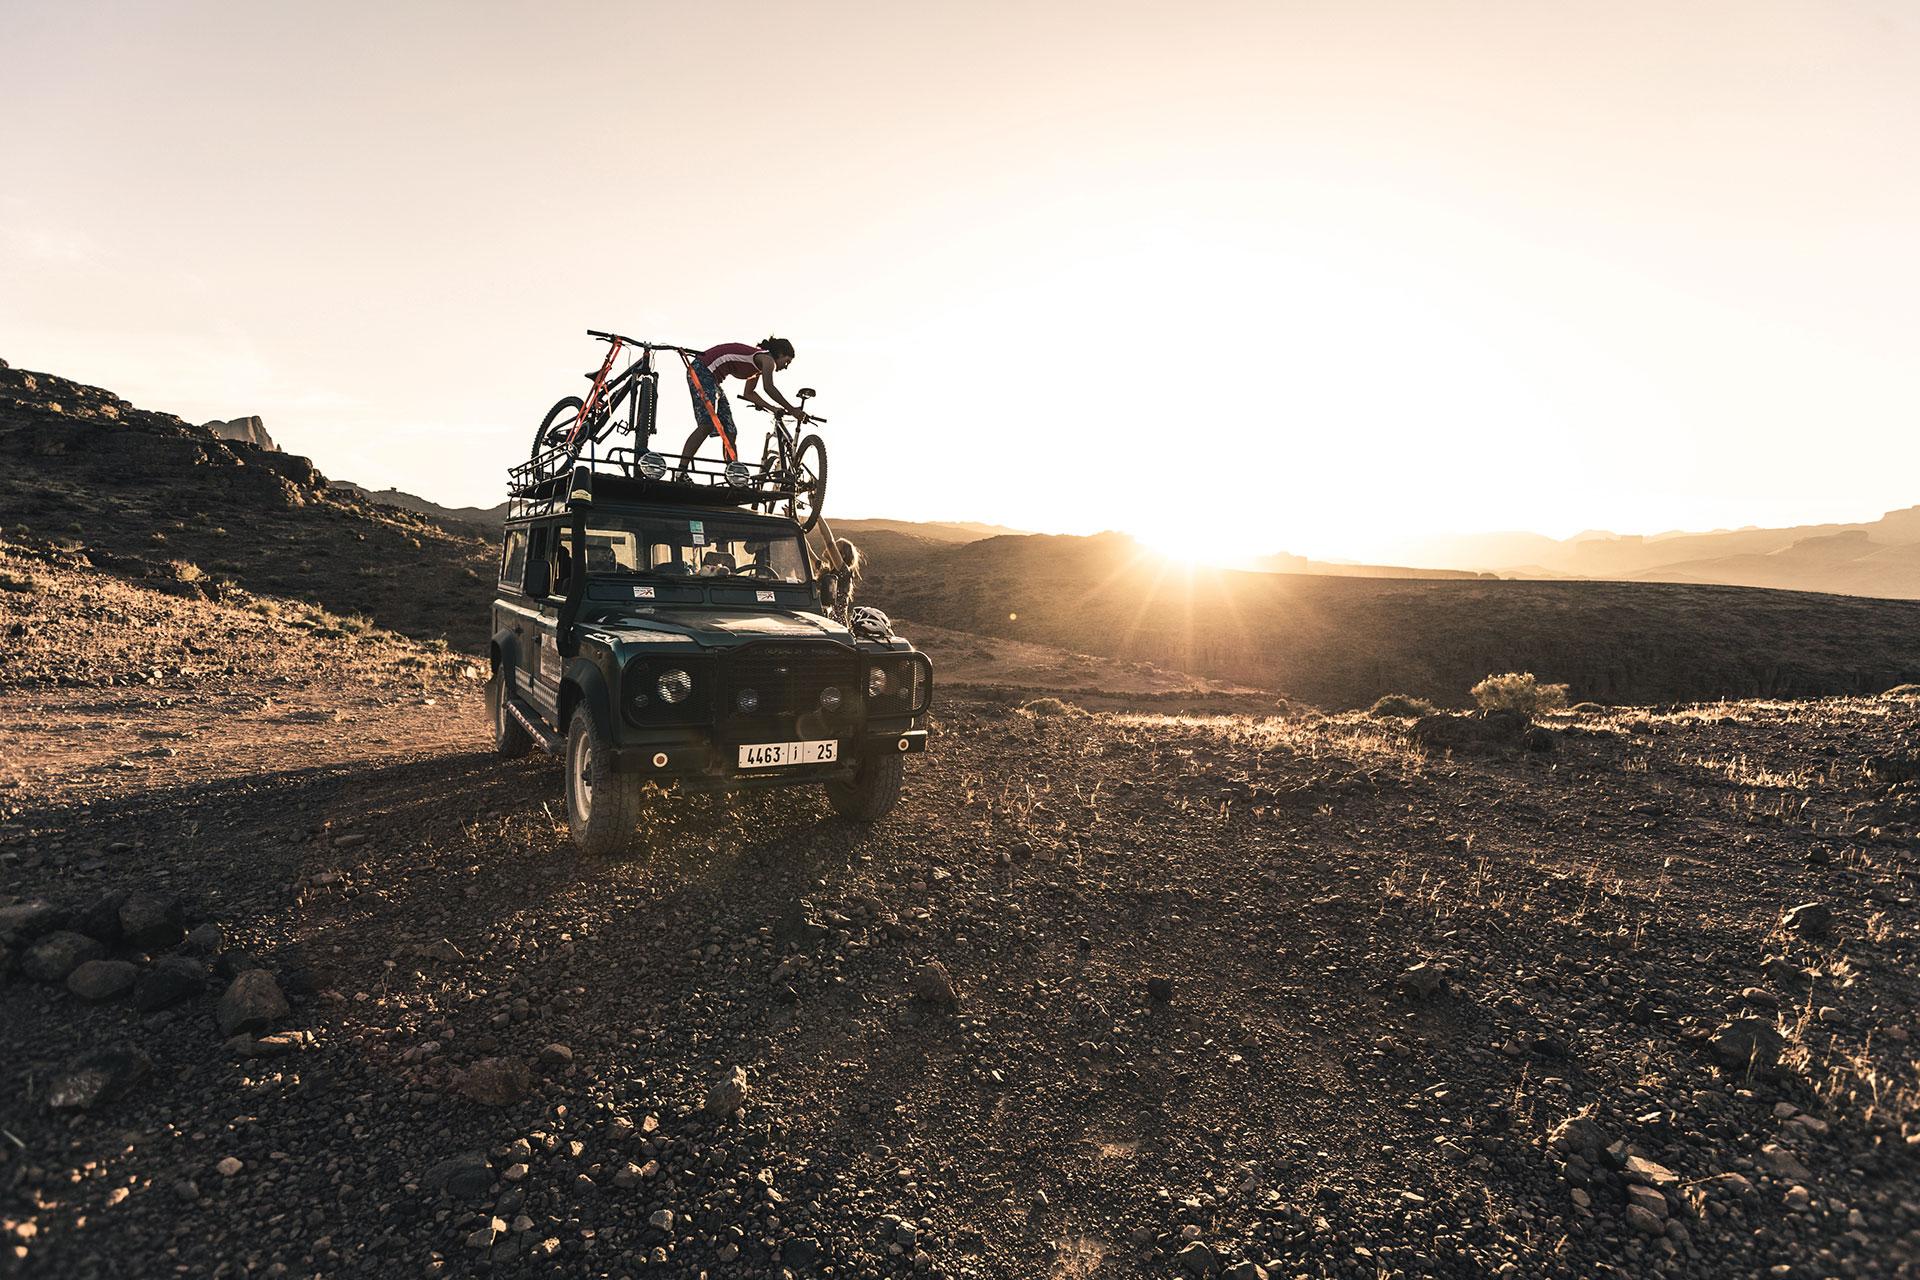 Defender Fotograf Outdoor Reise Travel Mountainbike Marokko Katalogproduktion